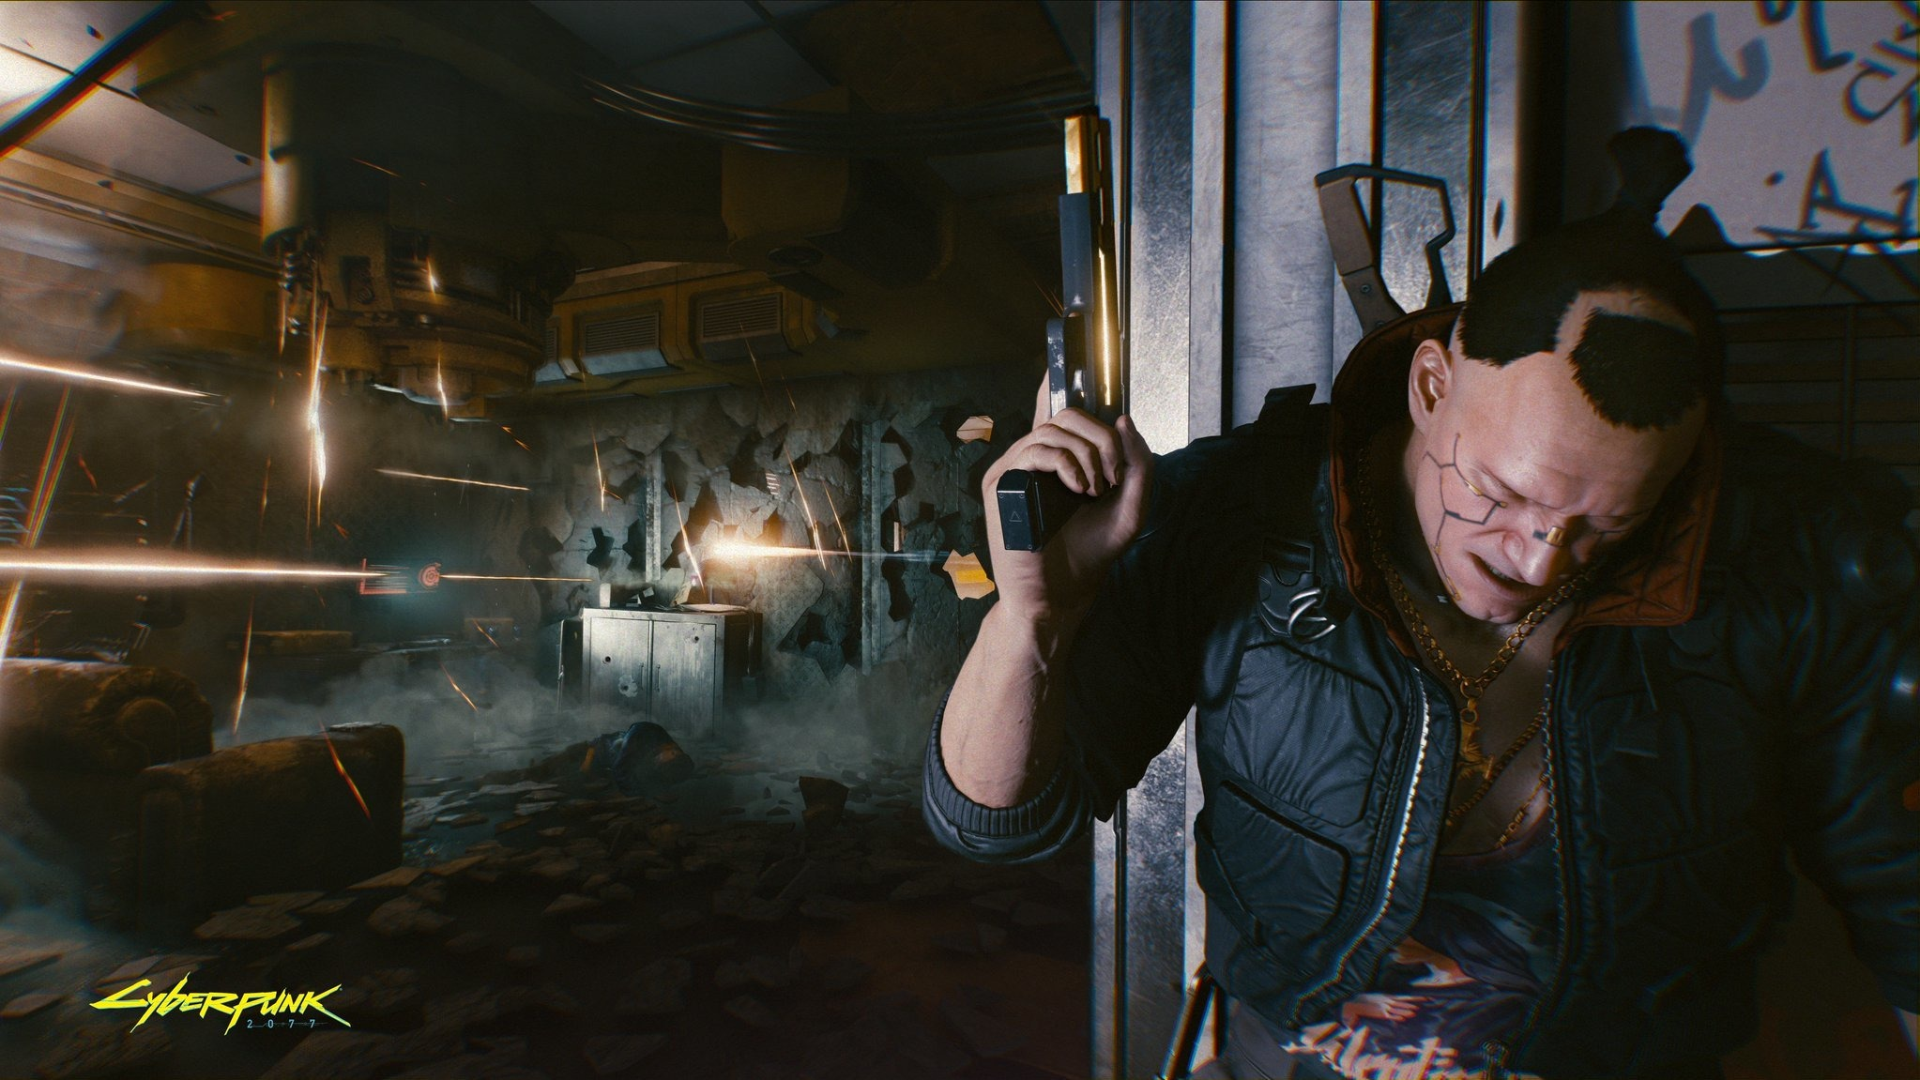 New Gamescom 2018 screenshots for Cyberpunk 2077 released